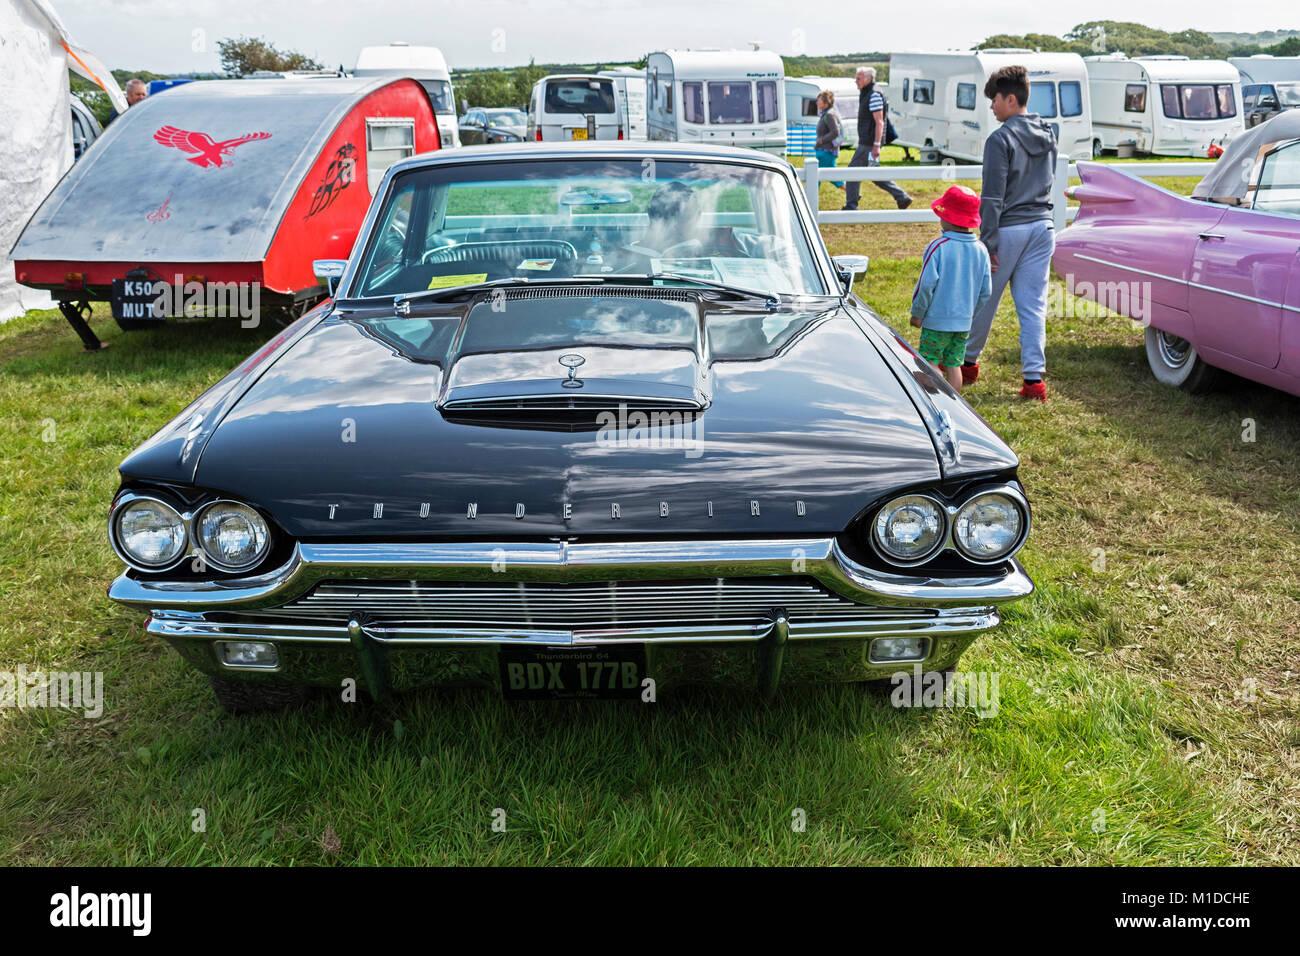 a 64 vintage classic thunderbird motor car - Stock Image